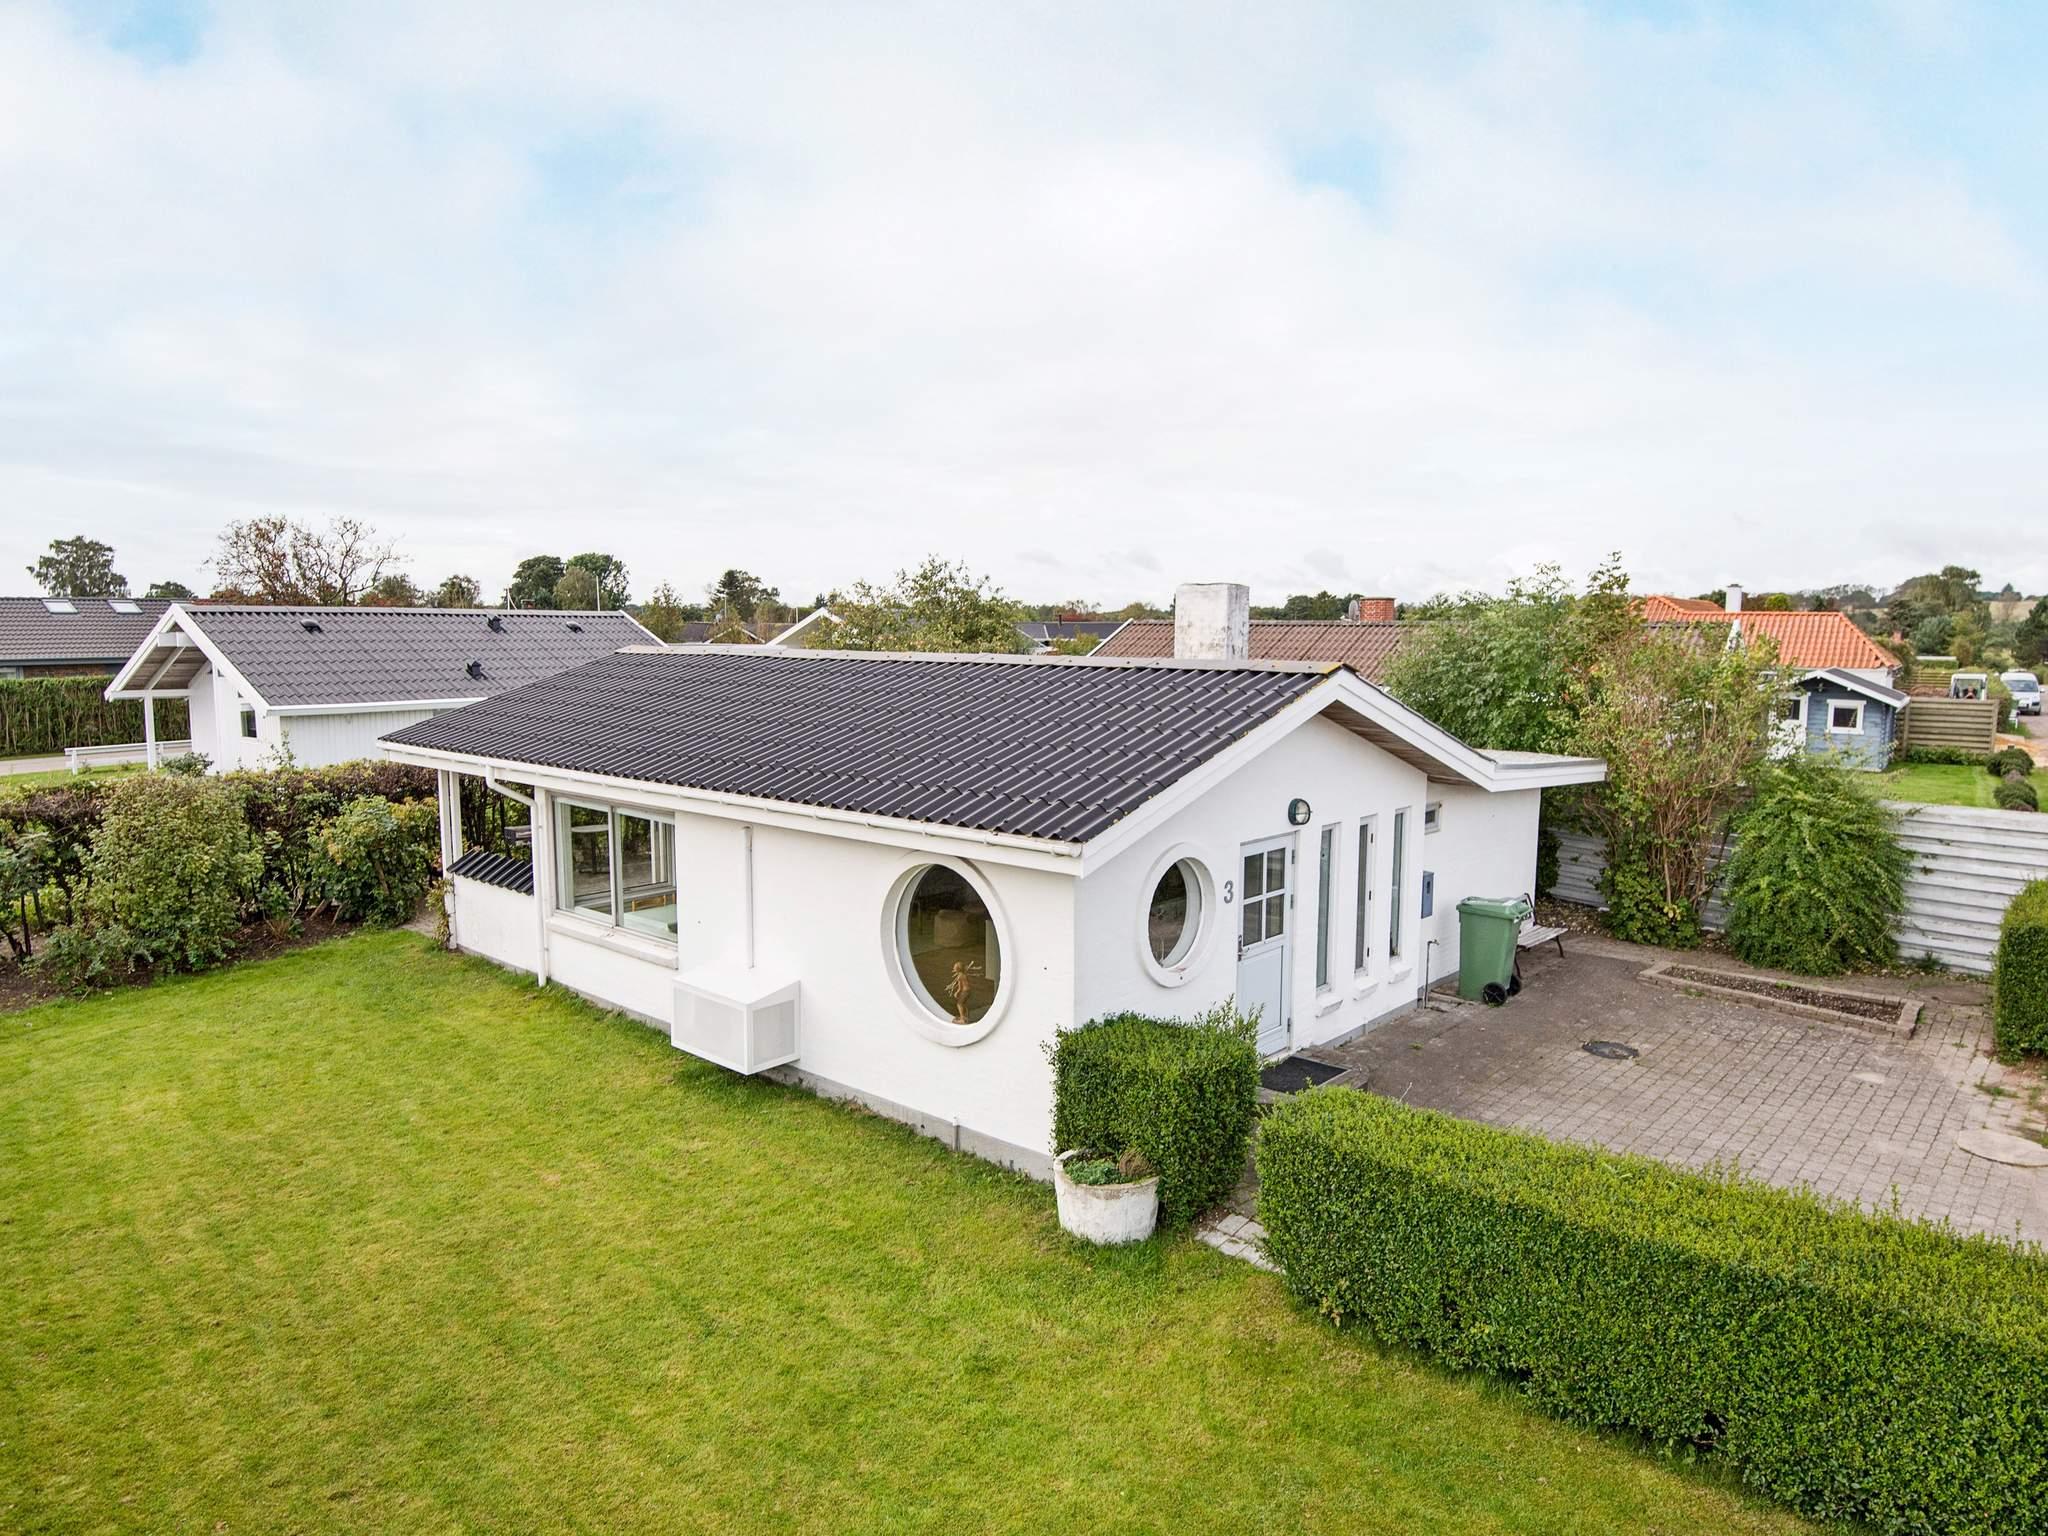 Ferienhaus Ajstrup Strand/Malling (2355032), Ajstrup, , Ostjütland, Dänemark, Bild 1